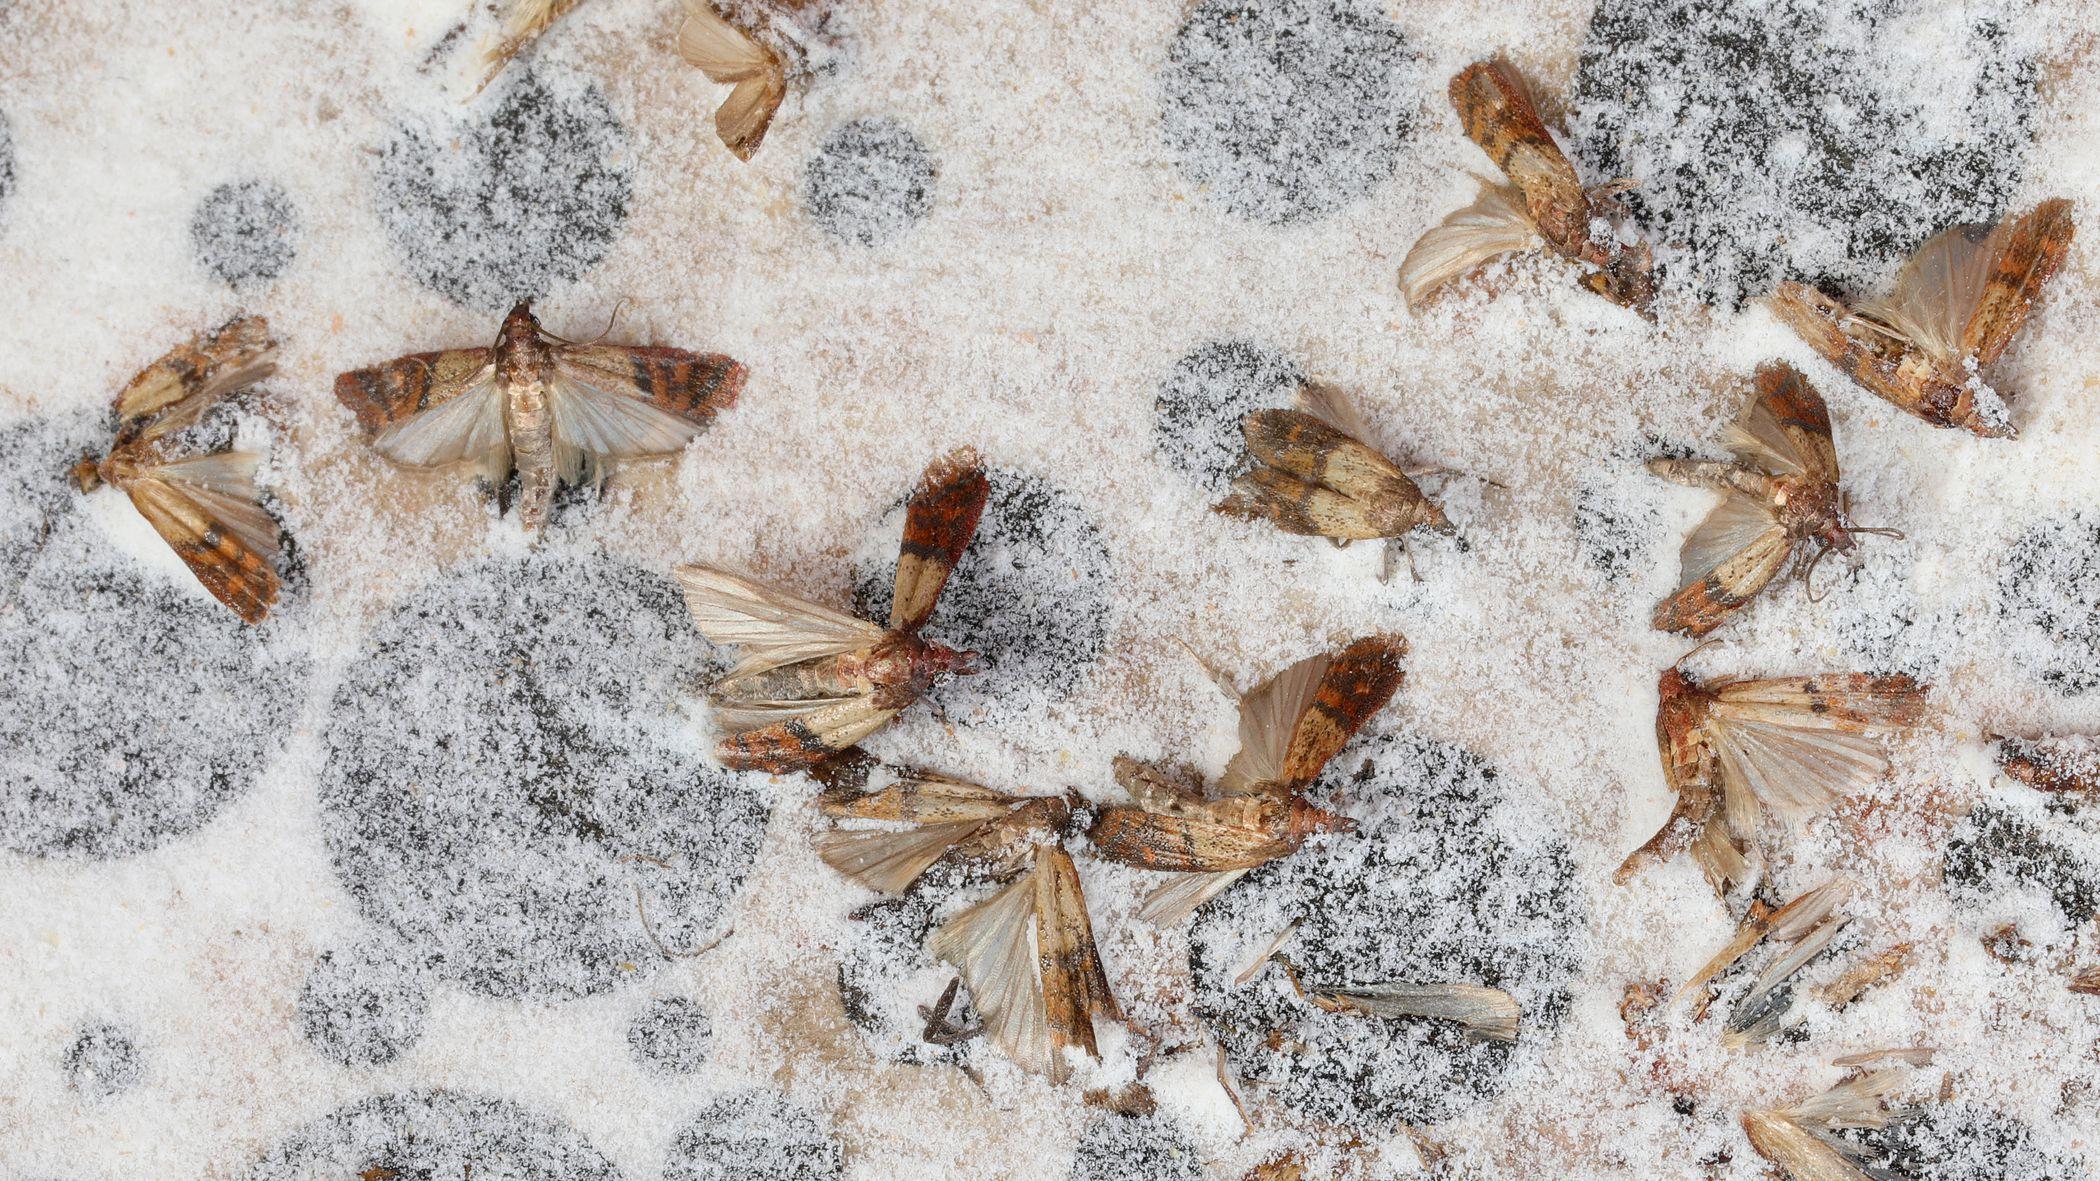 Pantry Pests Indianmeal Moths In Food